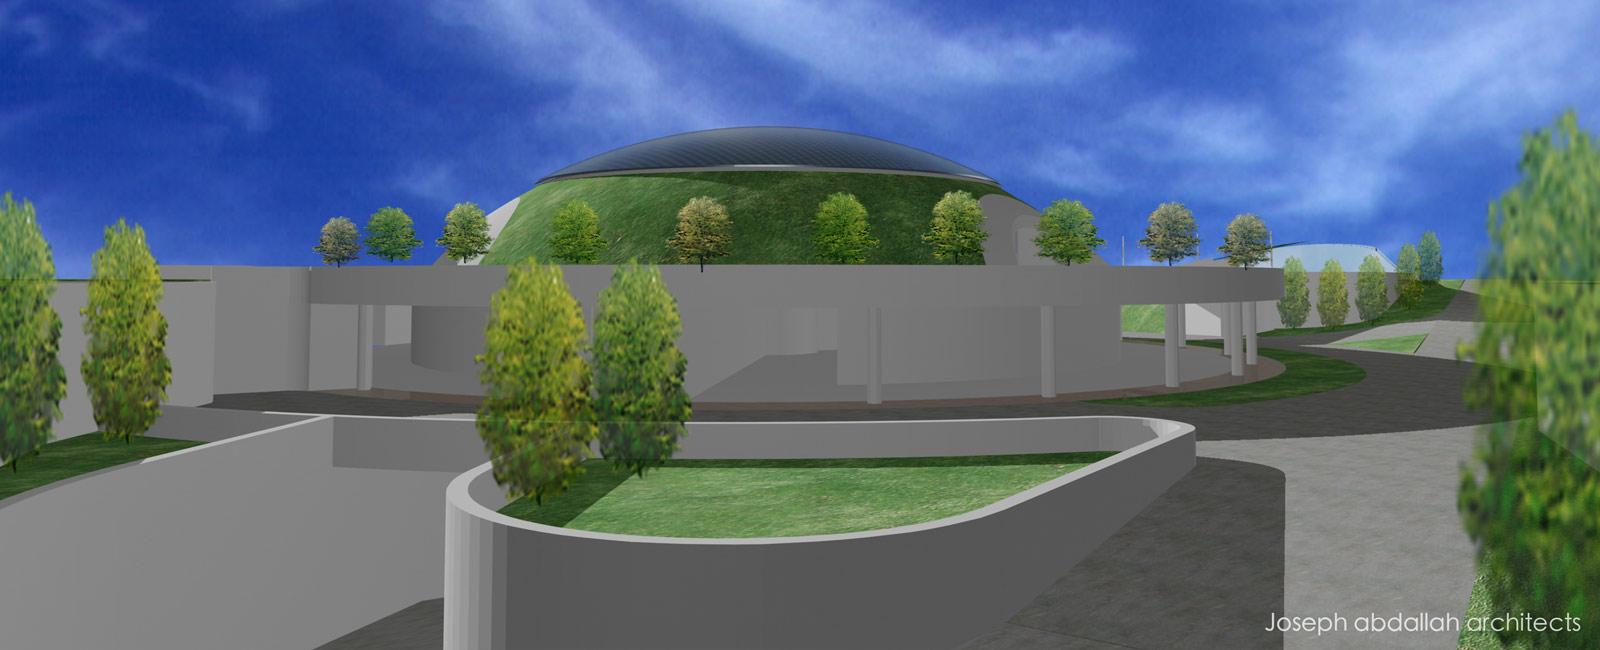 slaughterhouse-zhgharta-lebanon-modern-archiecture-eco-friendly-joseph-abdallah-architects-6